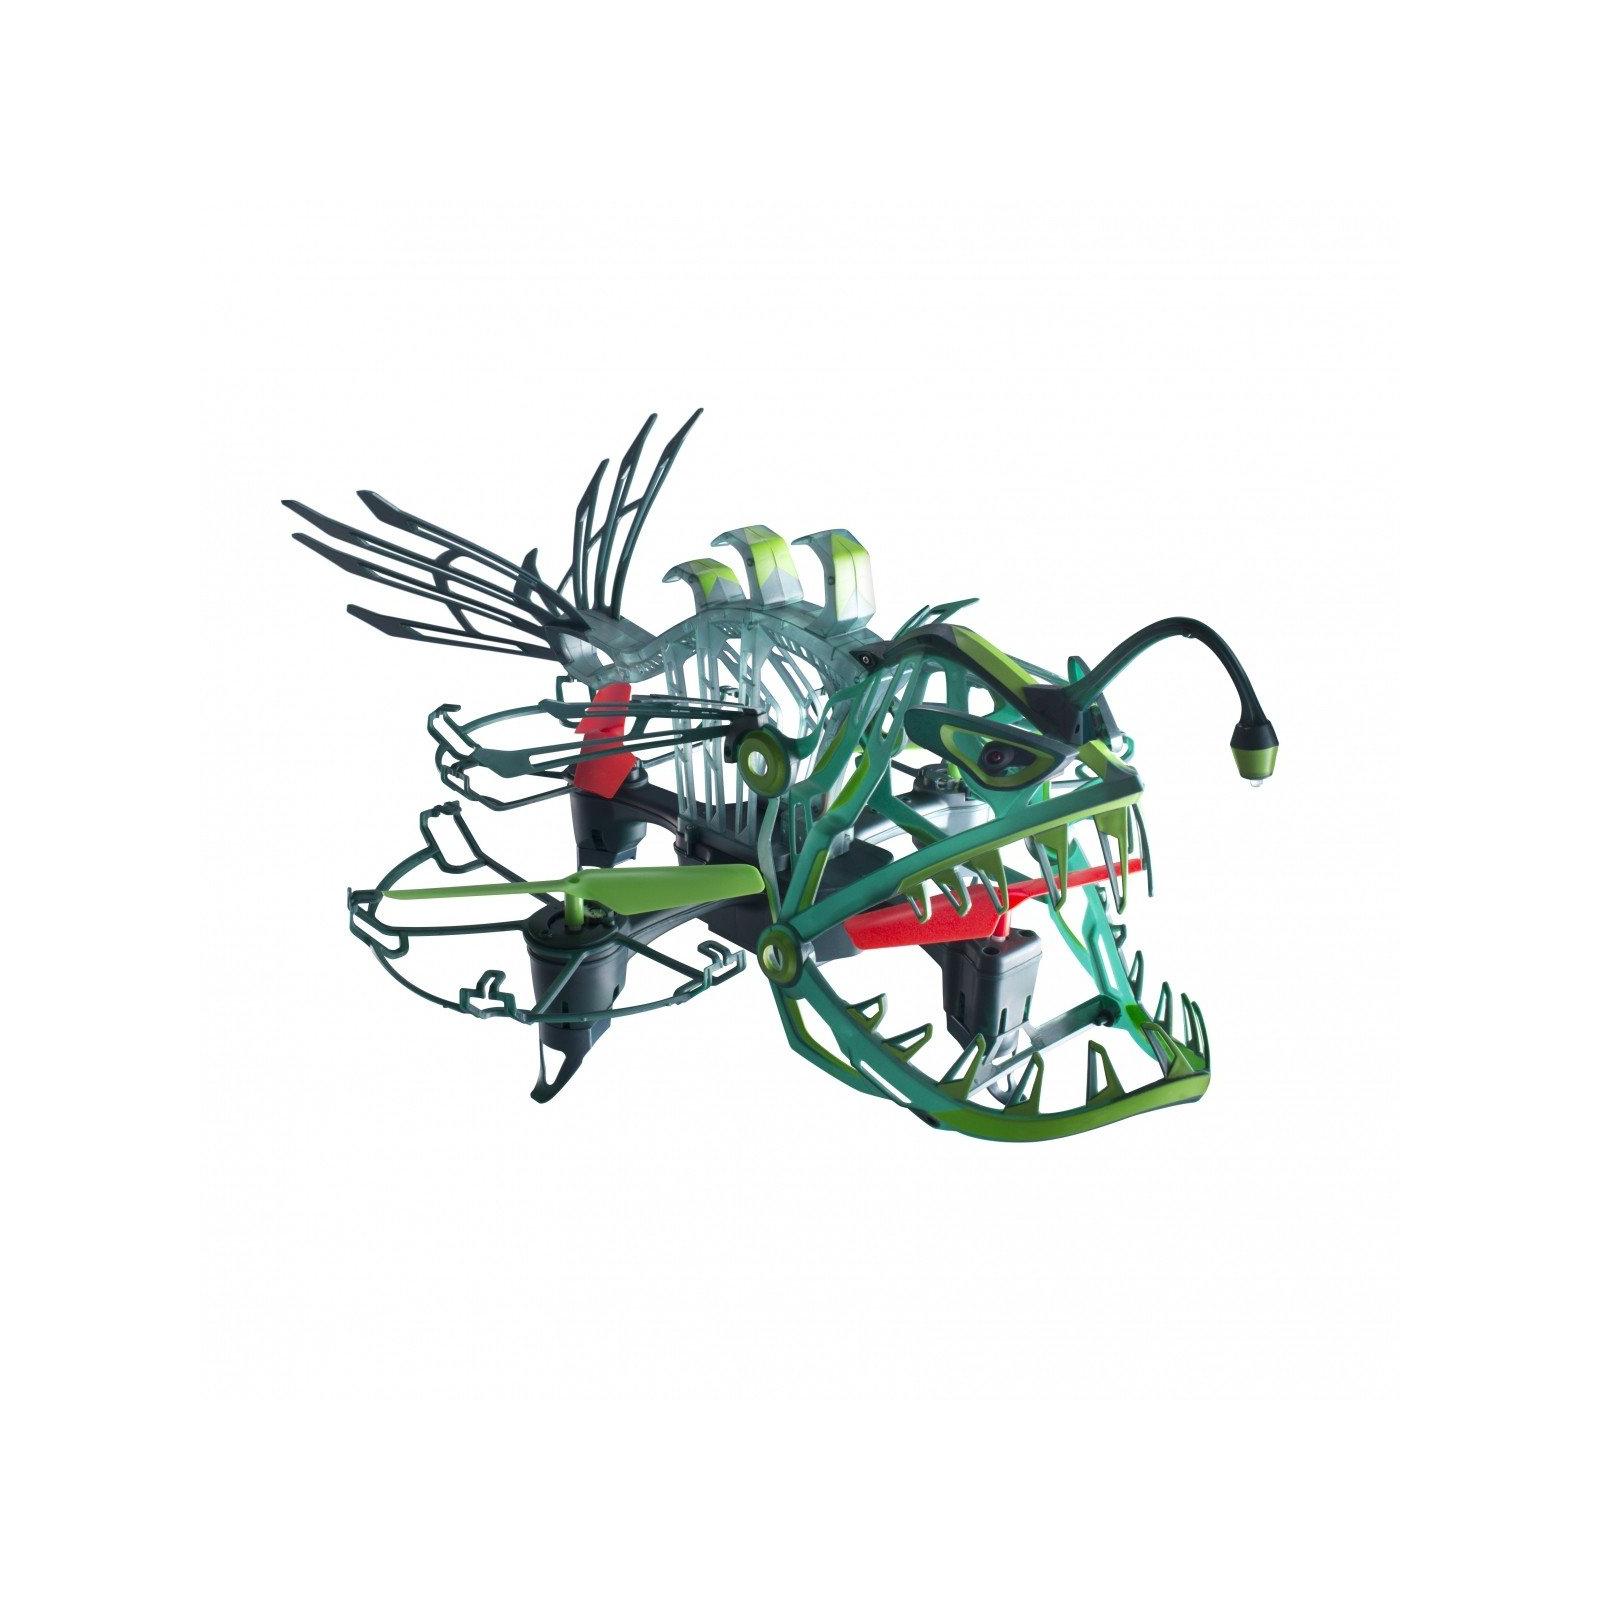 Квадрокоптер Auldey Drone Force дослідник та захісник Angler Attack (YW858300)